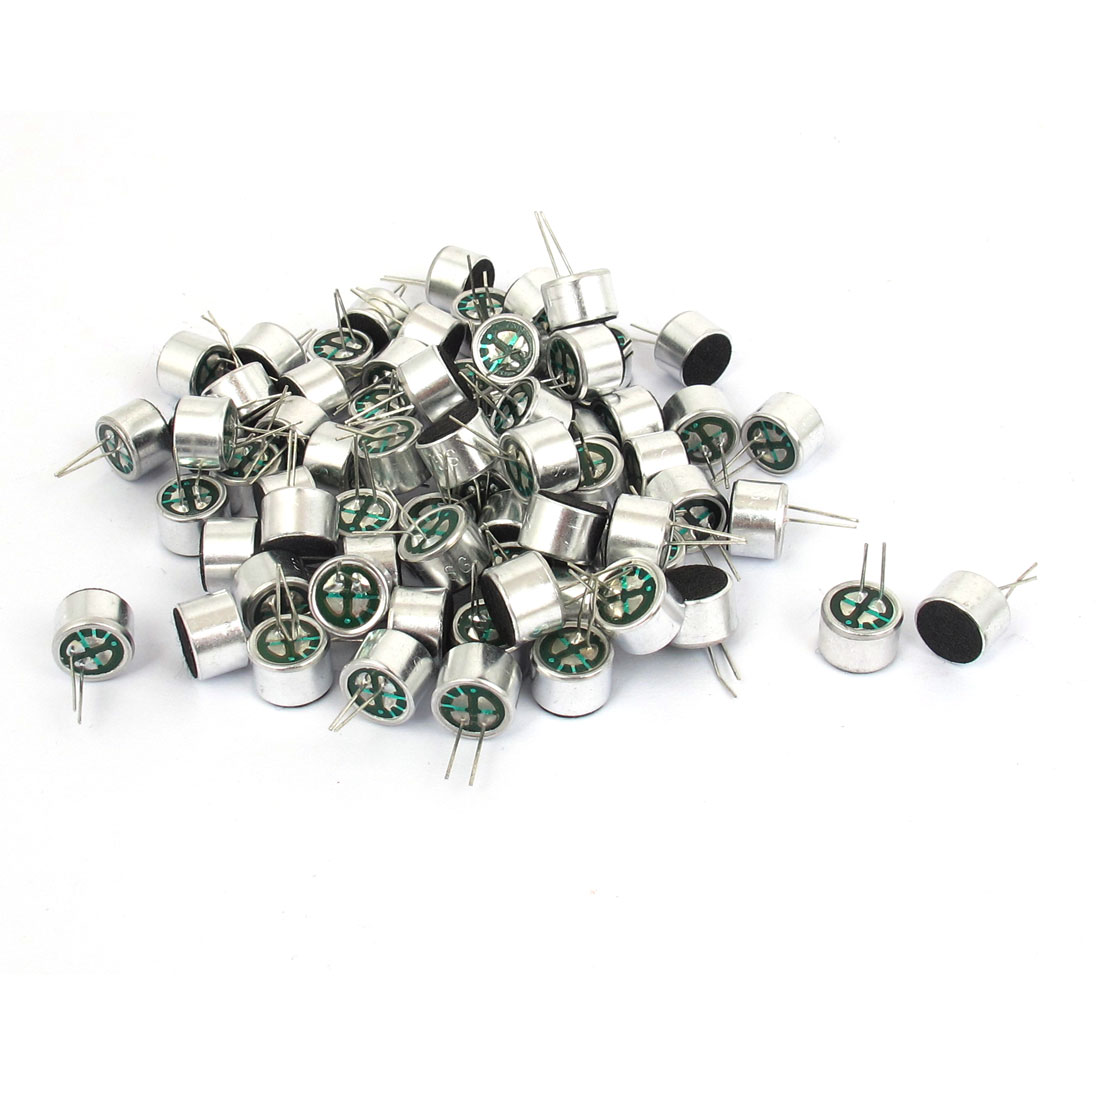 100pcs Cylinder 2 Terminals Soldering Mini Electret Microphone Condenser Pickup